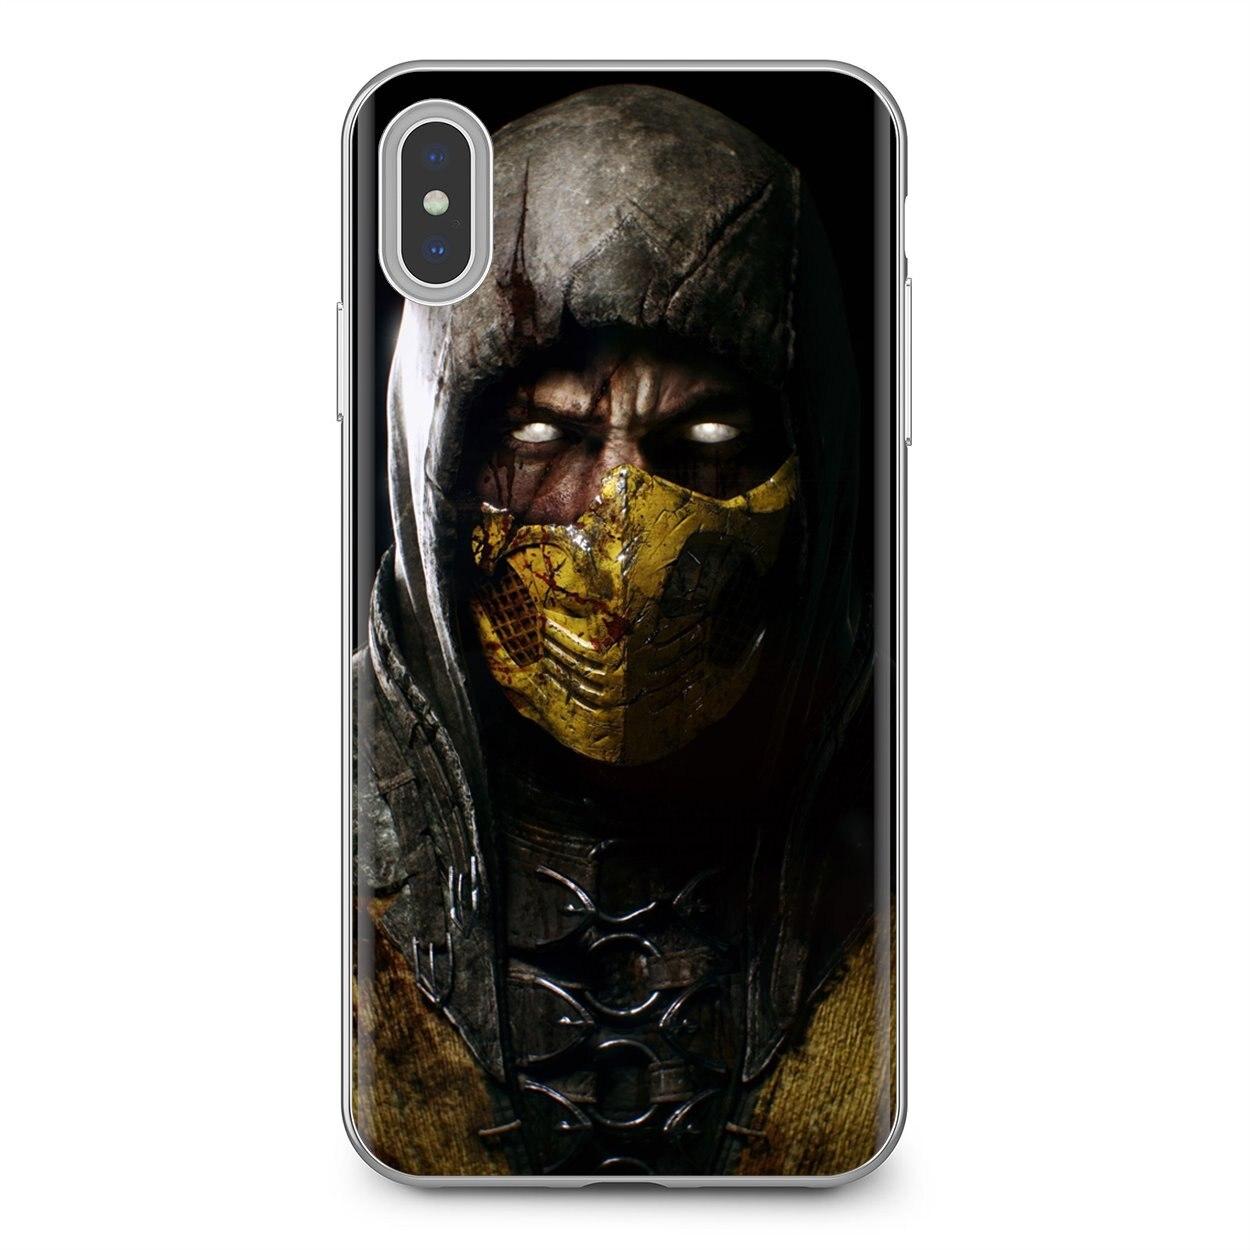 Barato de silicona teléfono caso Mortal Kombat bastante para Xiaomi Redmi 4A 7A S2 Nota 8 3S 3S 4 4X4 5X5 6 Plus 7 6A Pro teléfono móvil F1